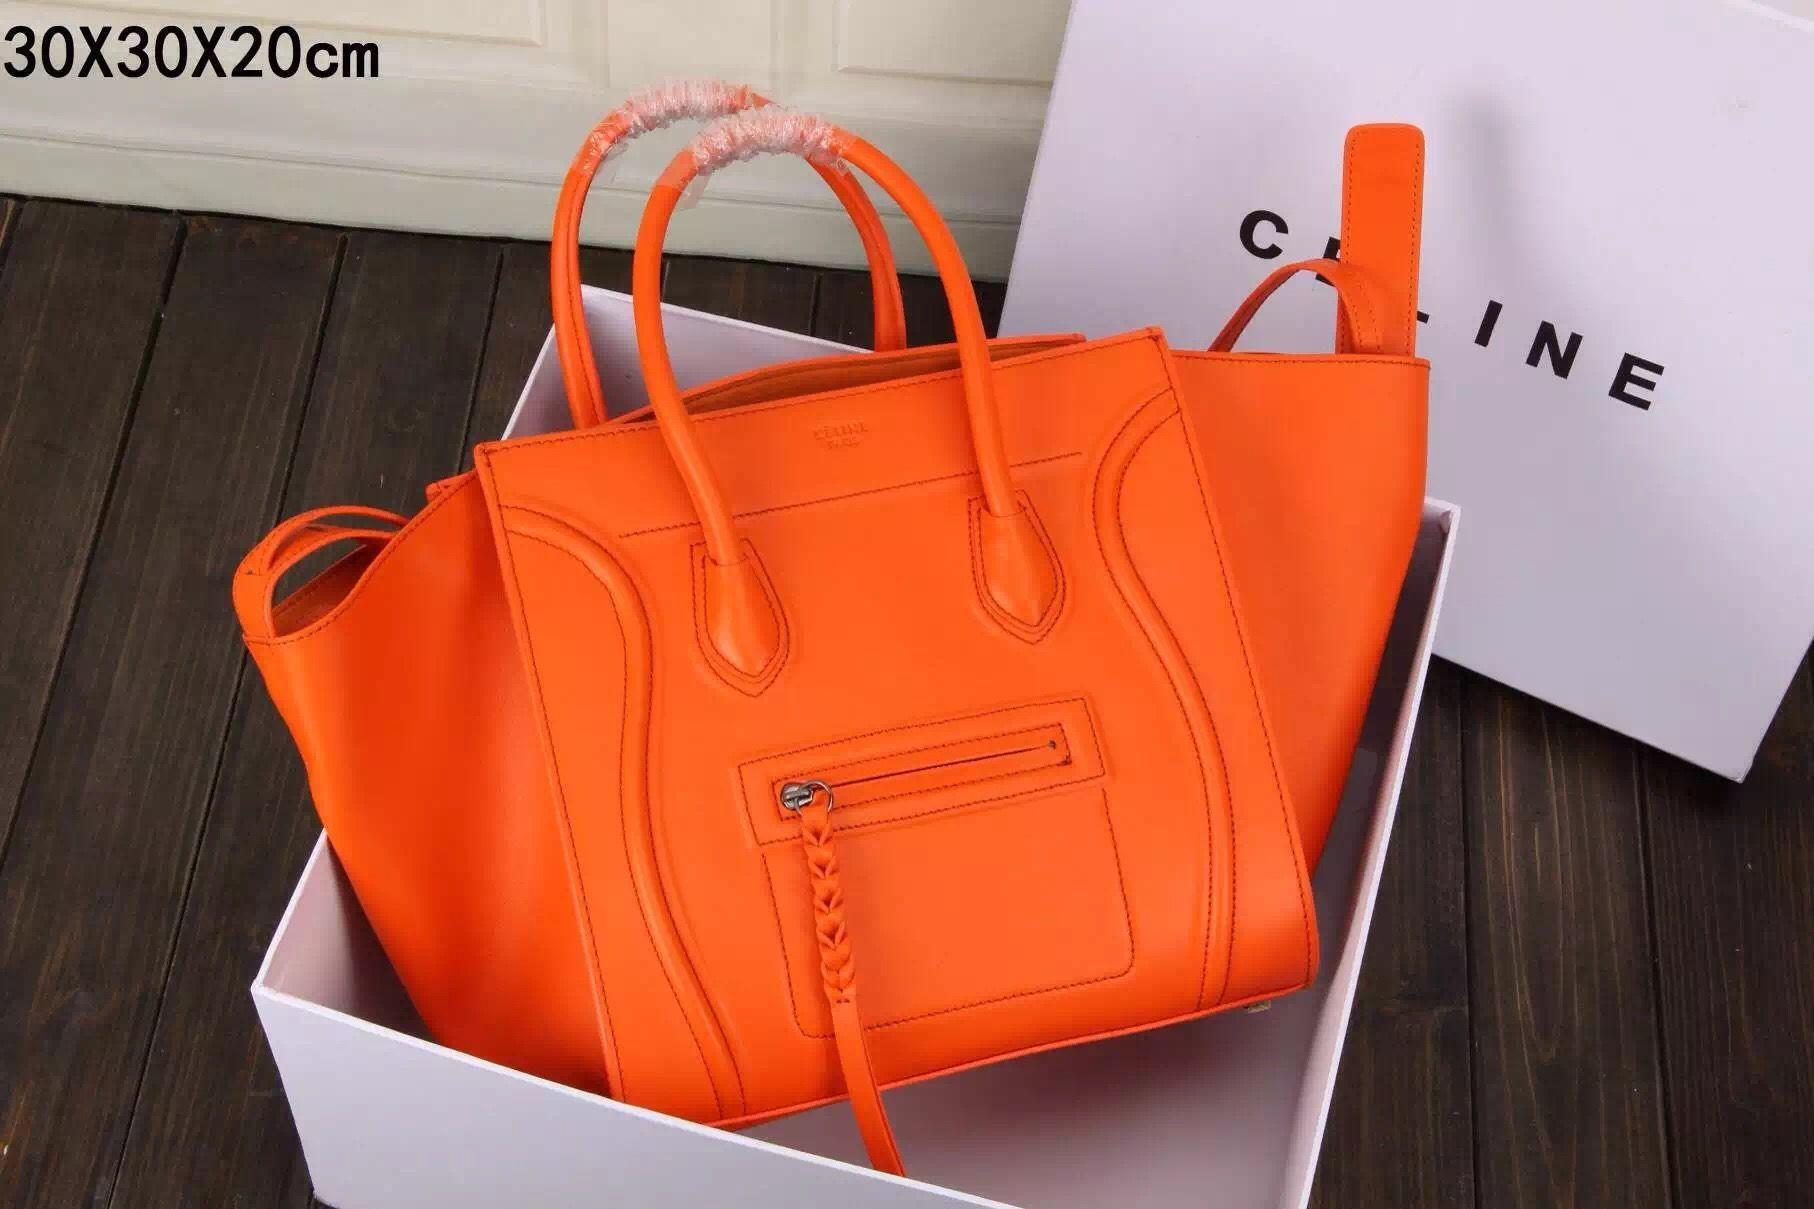 b758919811 Celine Luggage Phantom Bag in Orange Smooth Calfskin Leather ...